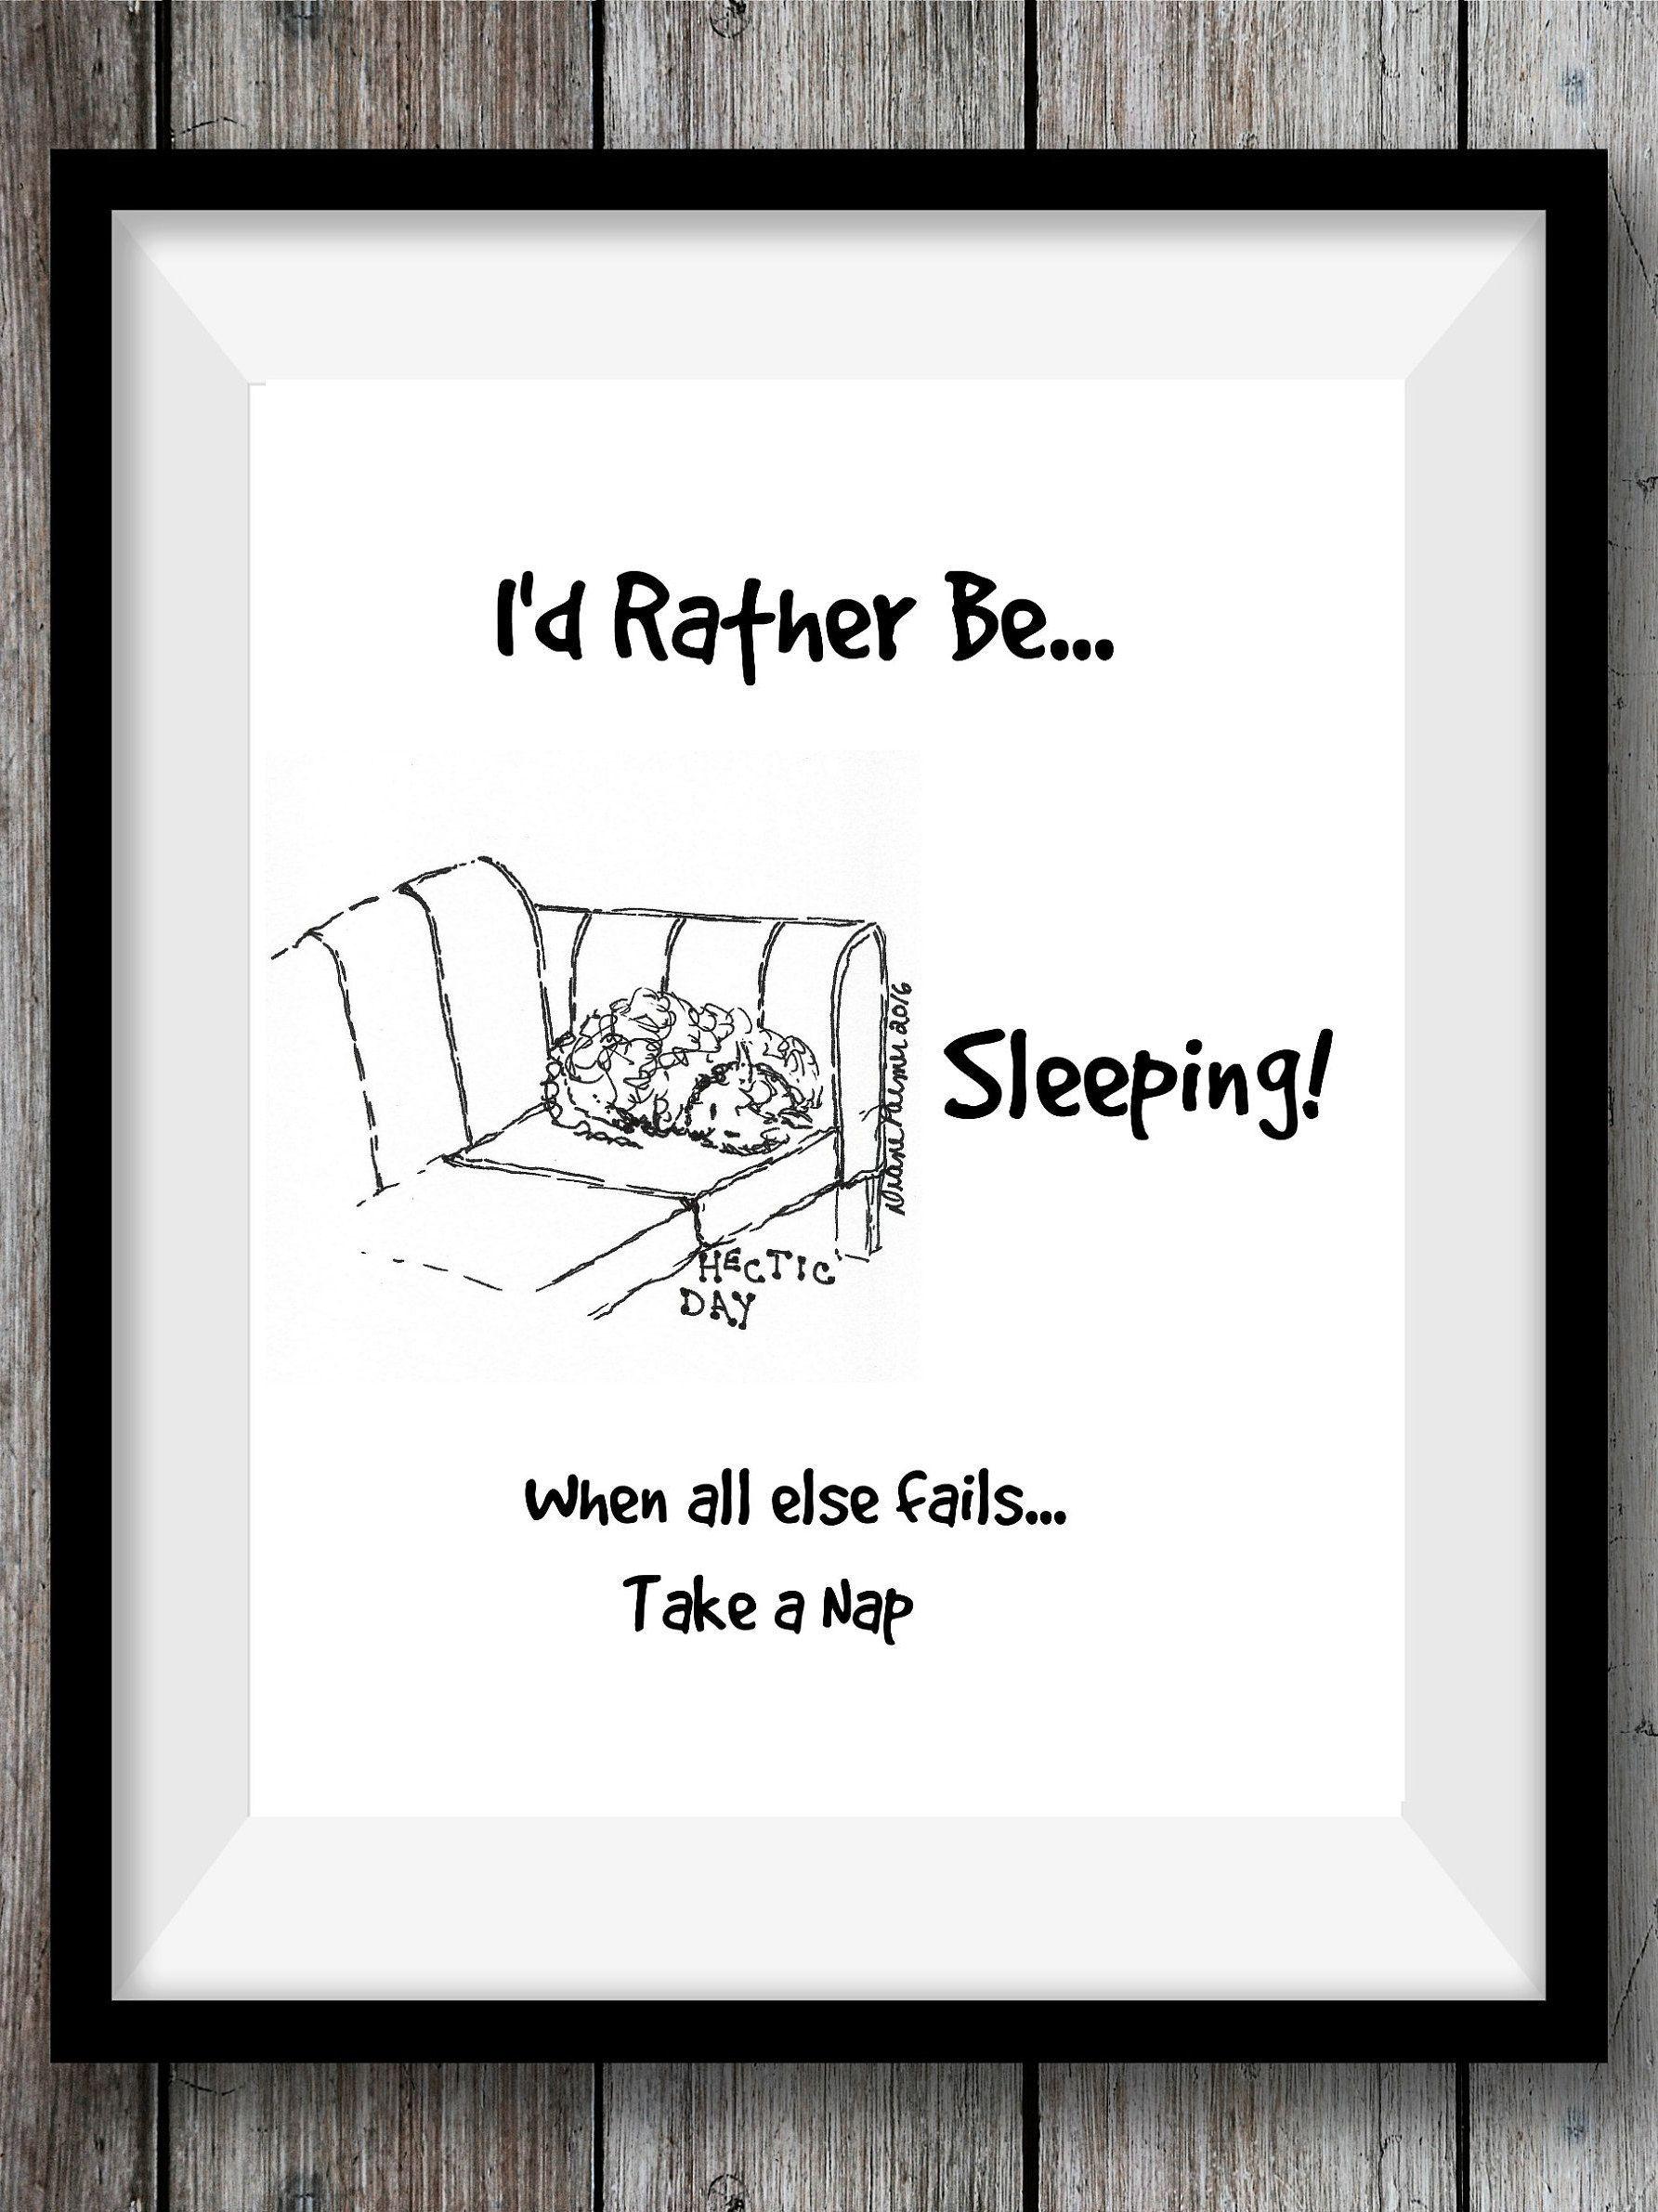 Iud rather be sleeping printable kitchen art printable quotes